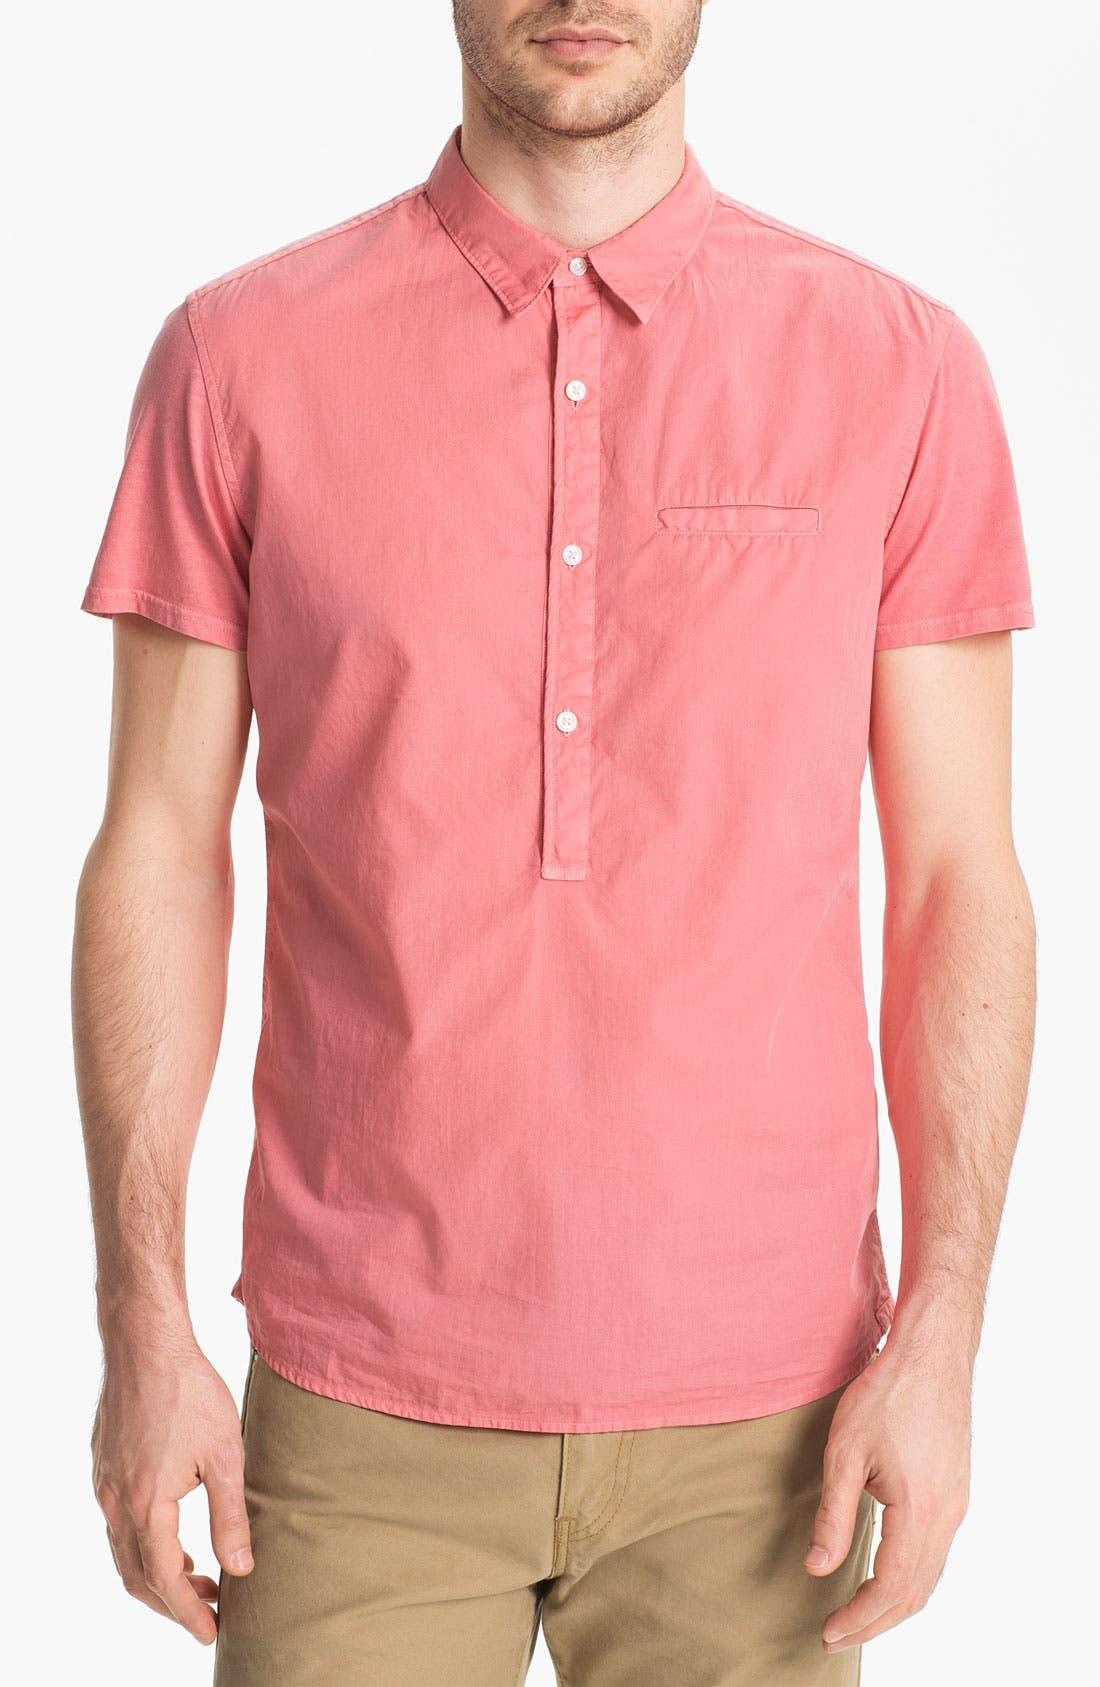 Alternate Image 1 Selected - Edun Short Sleeve Woven Pullover Shirt